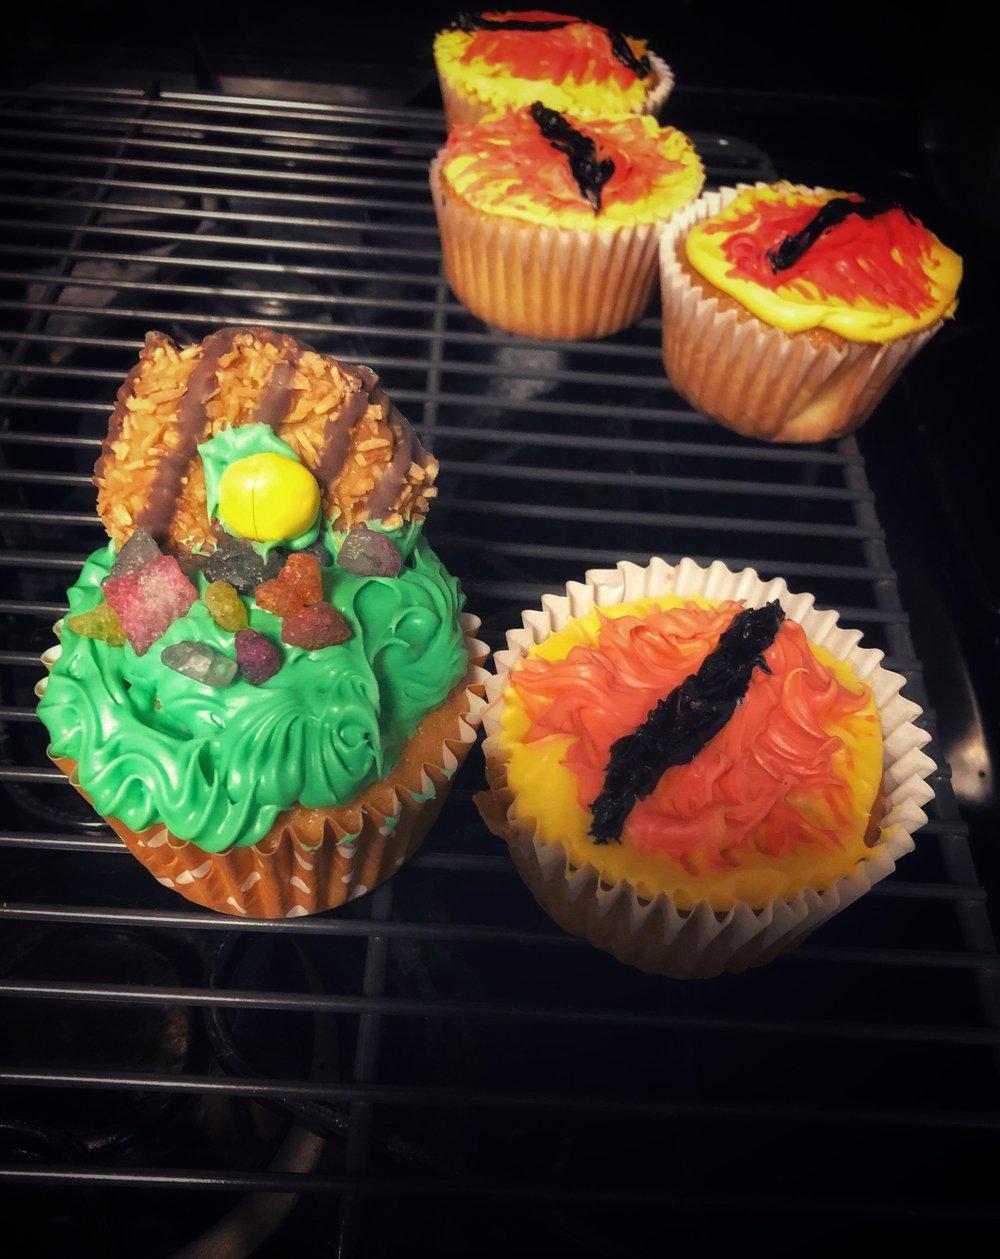 lotr-hobbit-cupcakes.jpeg